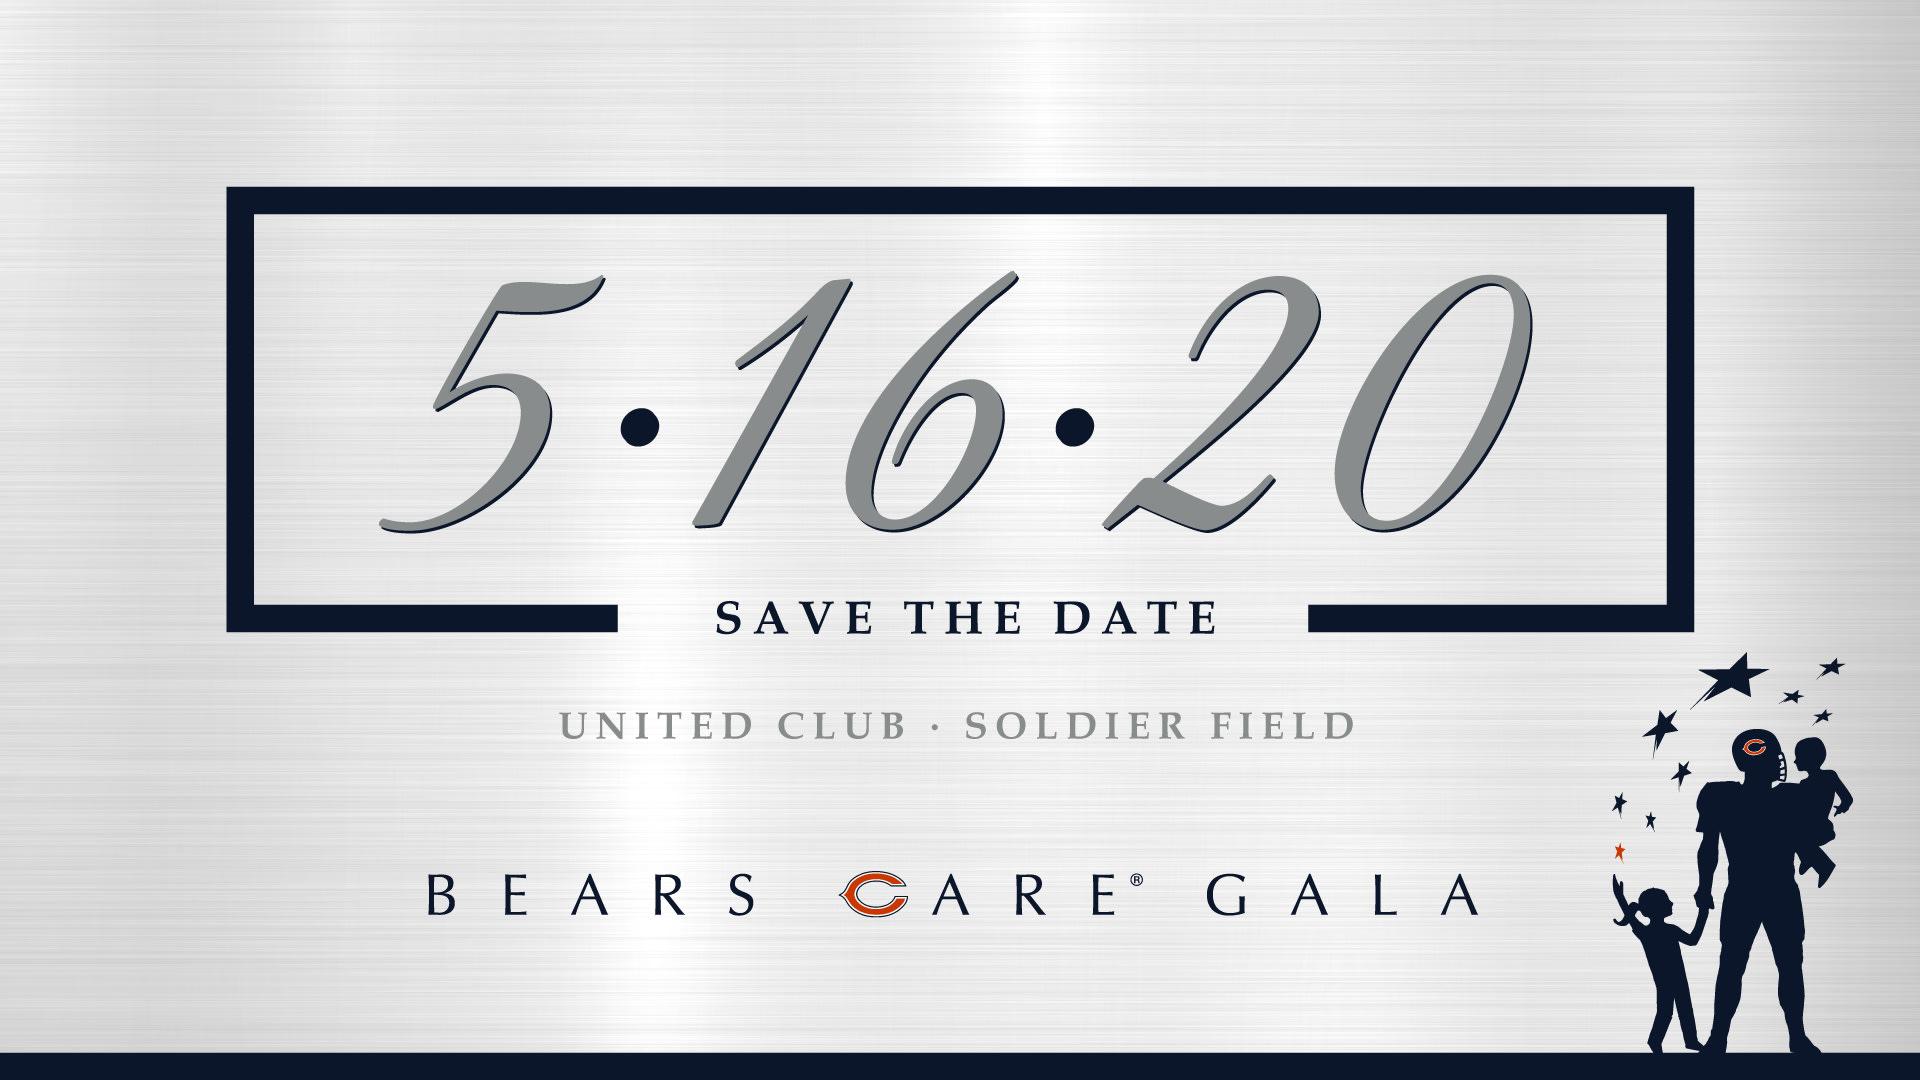 Bears Care Gala